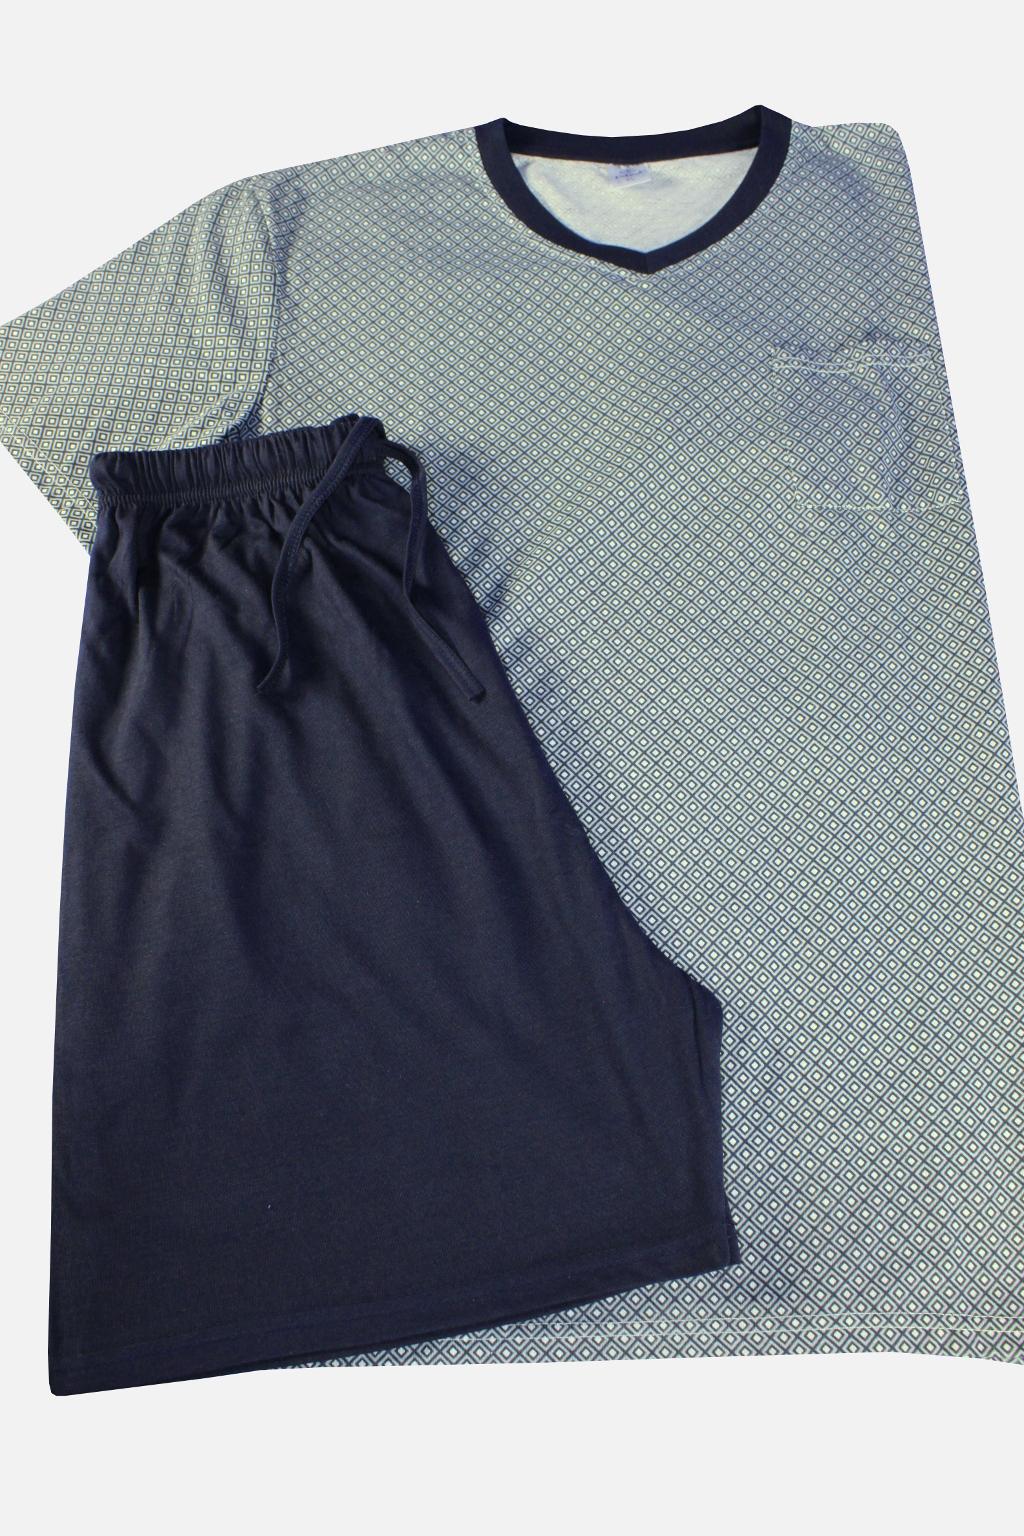 Javon pánské pyžamo XL tmavě modrá